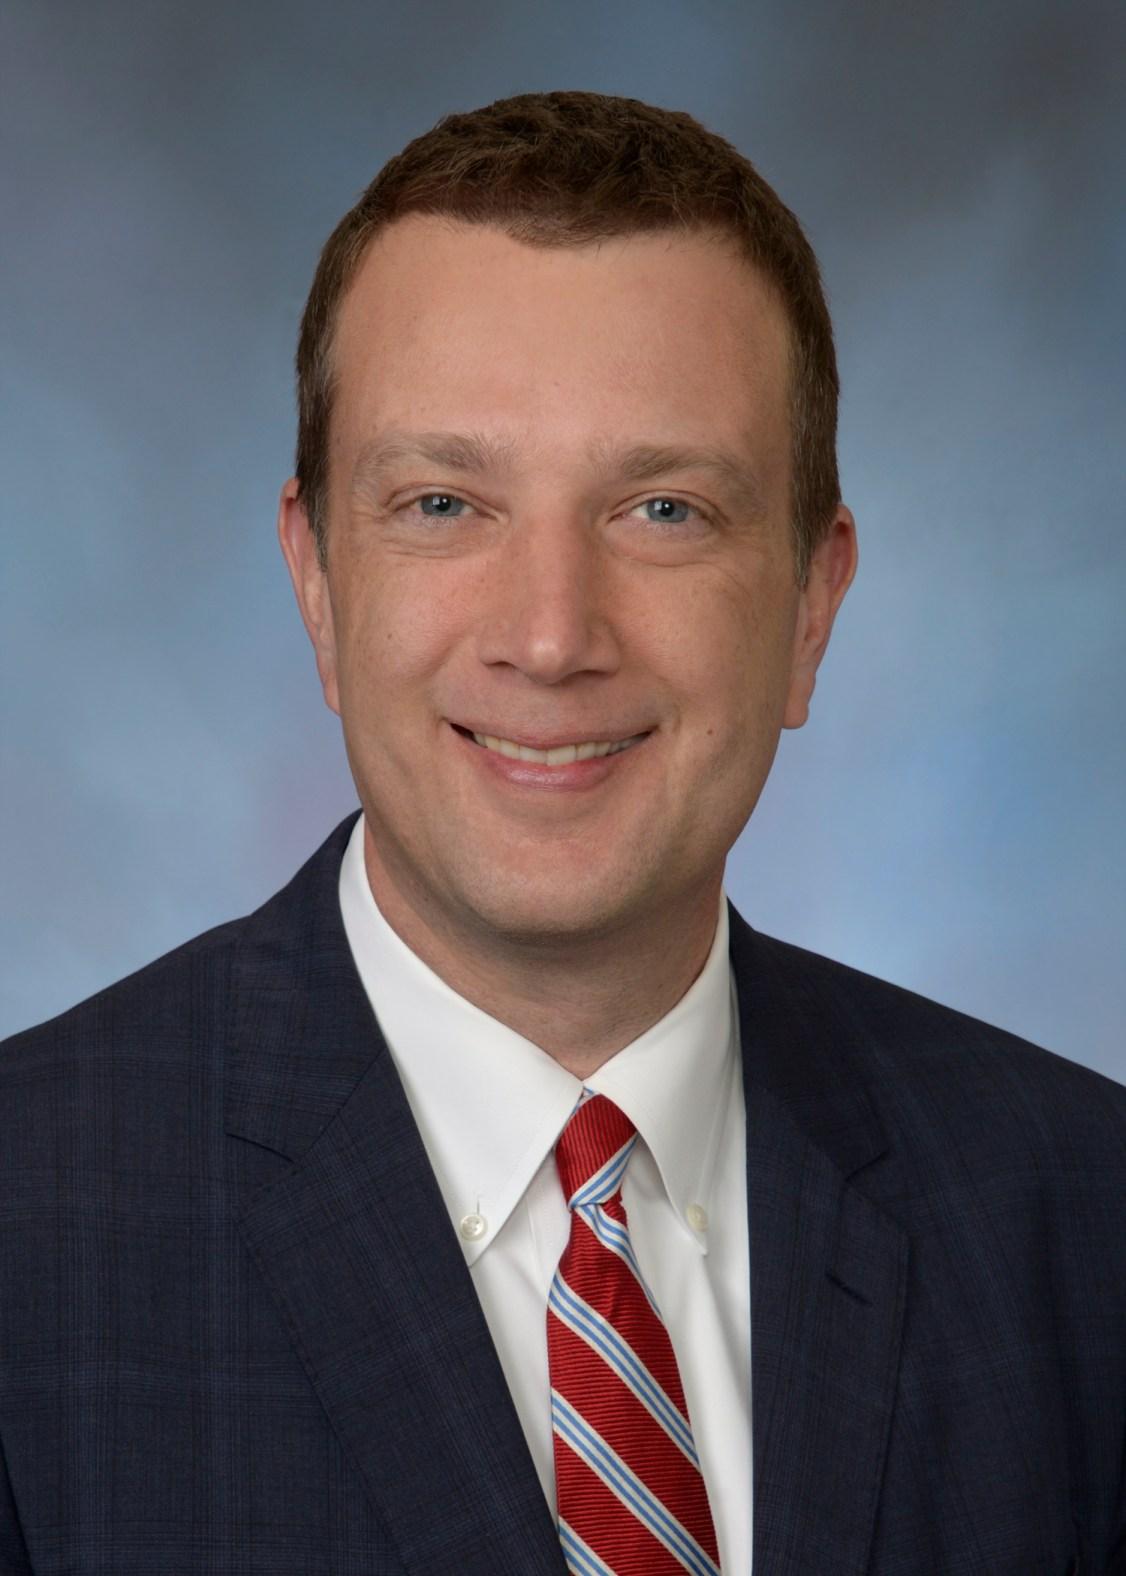 Councilmember Joe McDermott